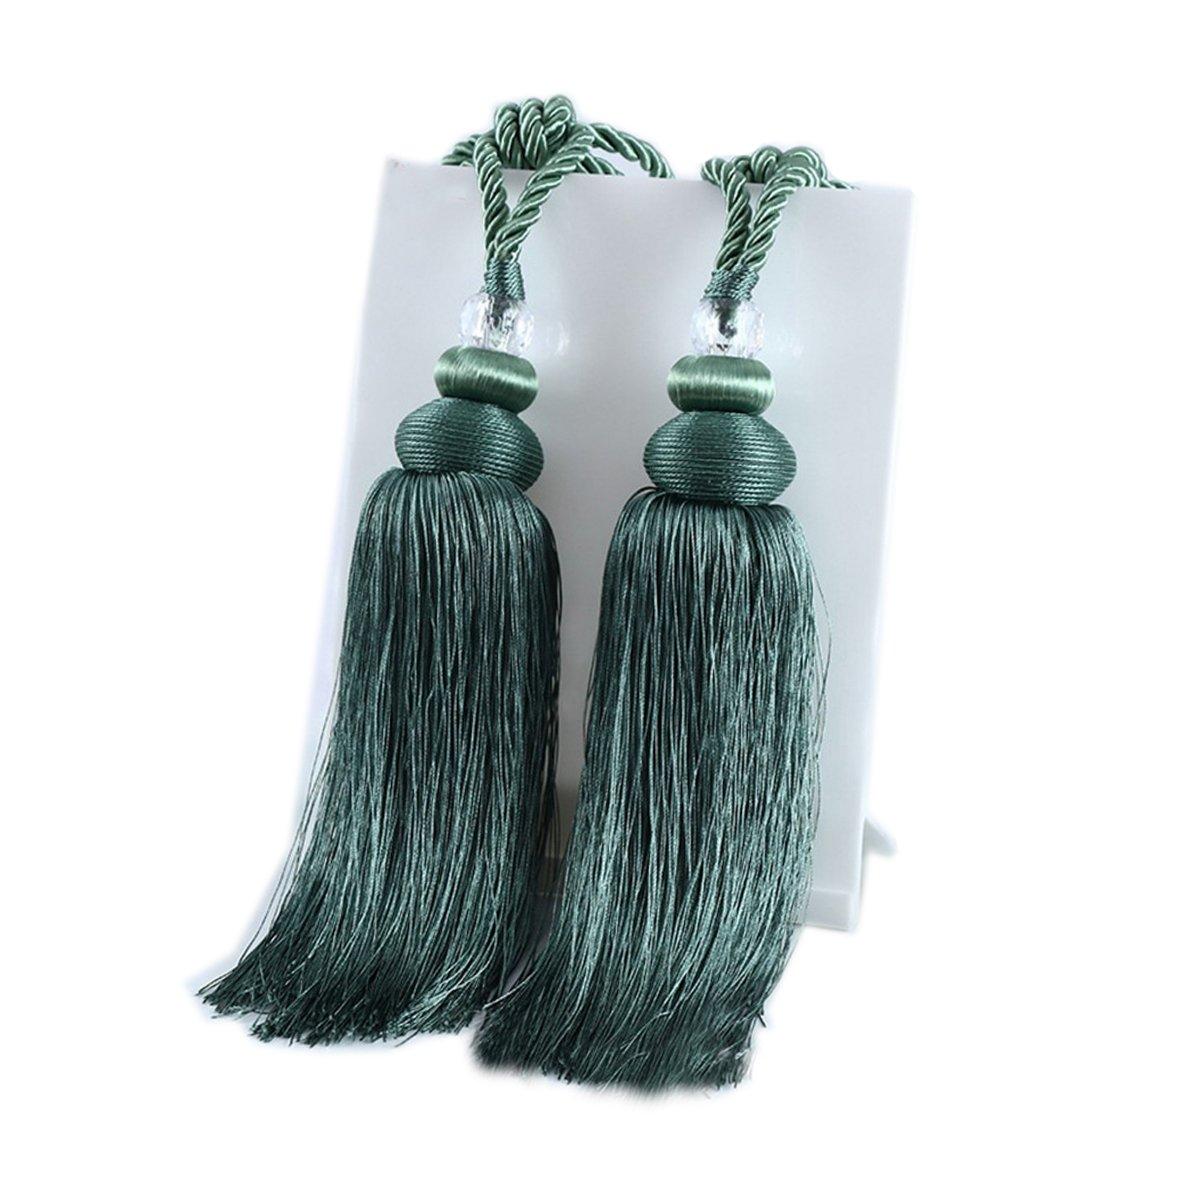 YYC 1Pair Rayon Crystal Ball Tassel Curtain Rope Tie Backs Cord Drapery Holdbacks (Green)